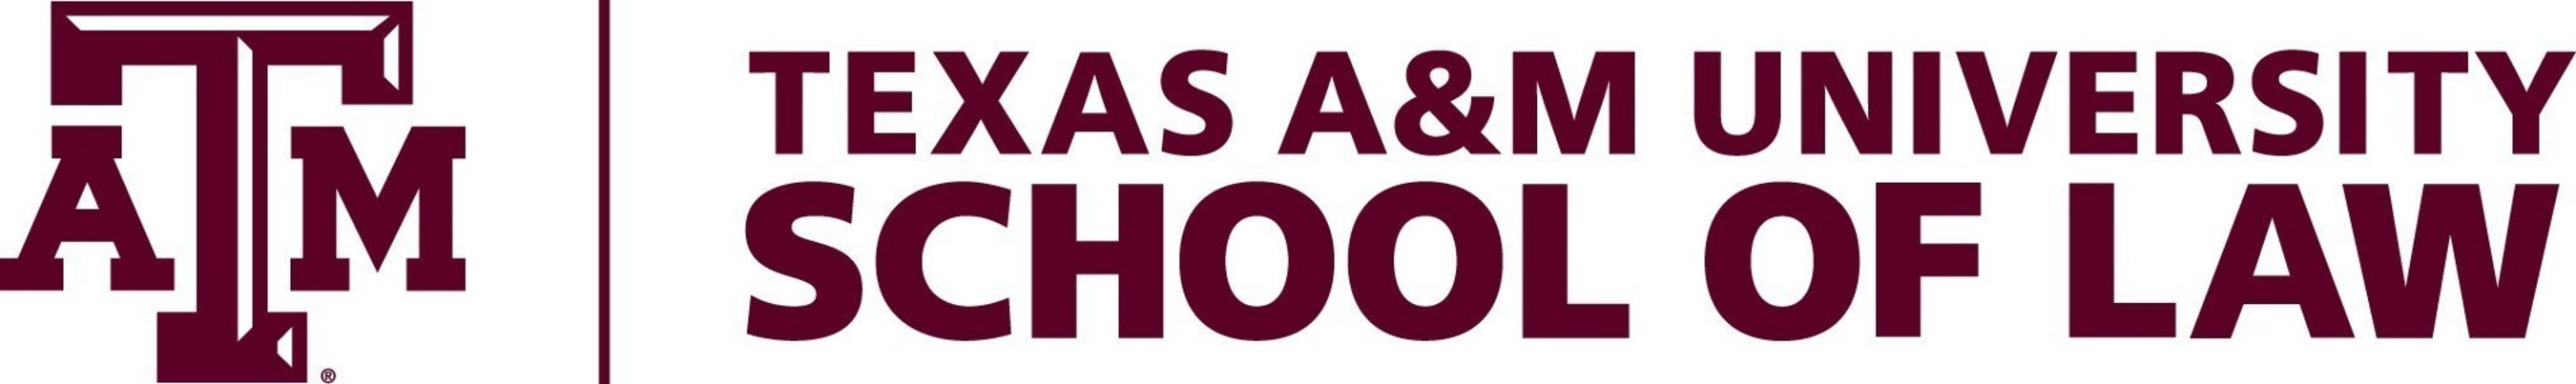 Texas A&M University School of Law logo